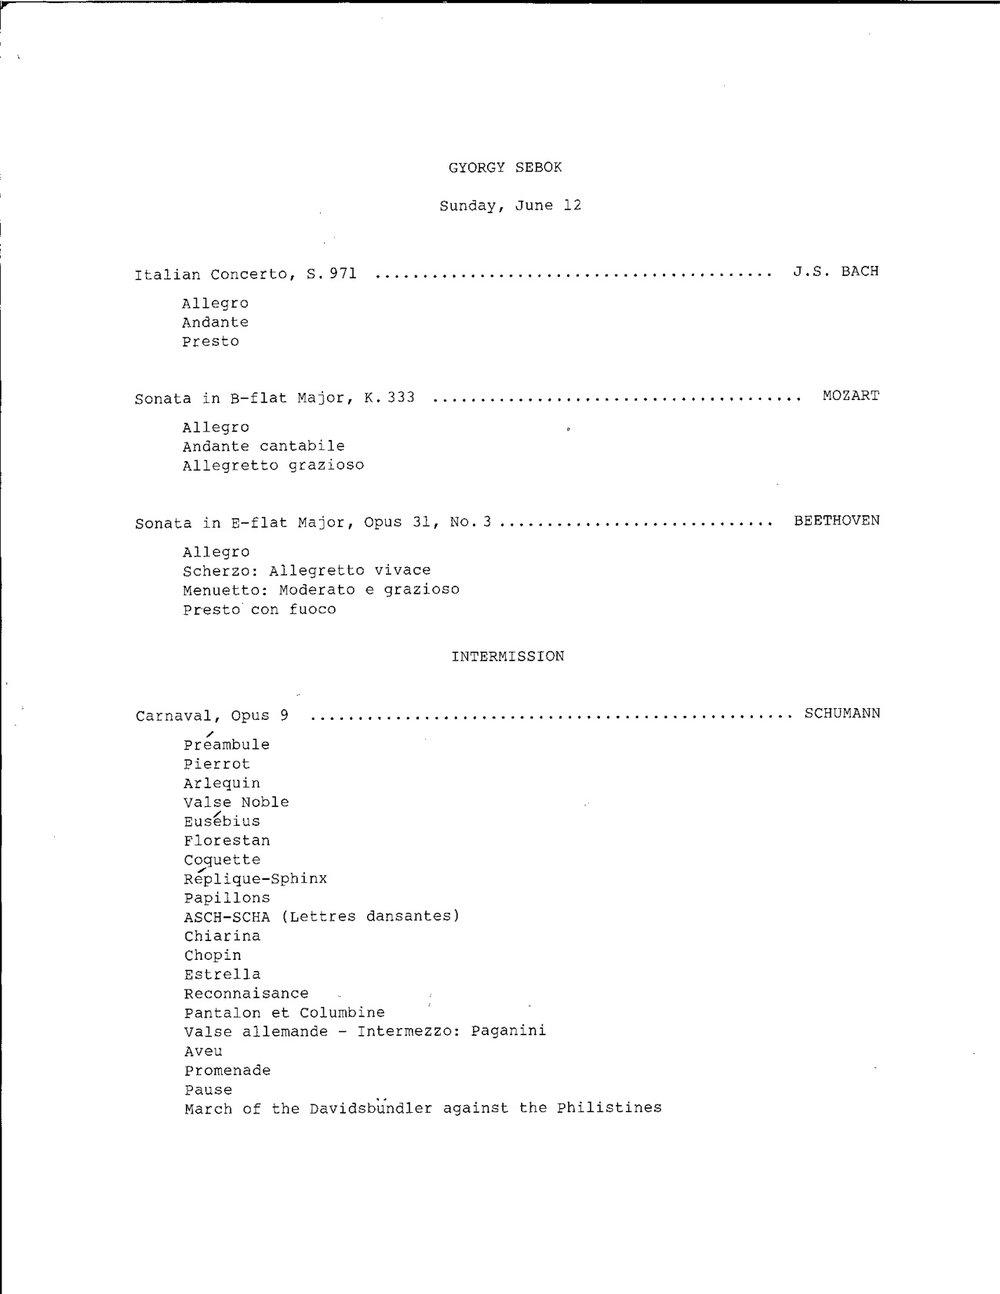 Sebok87-88_Program1.jpg